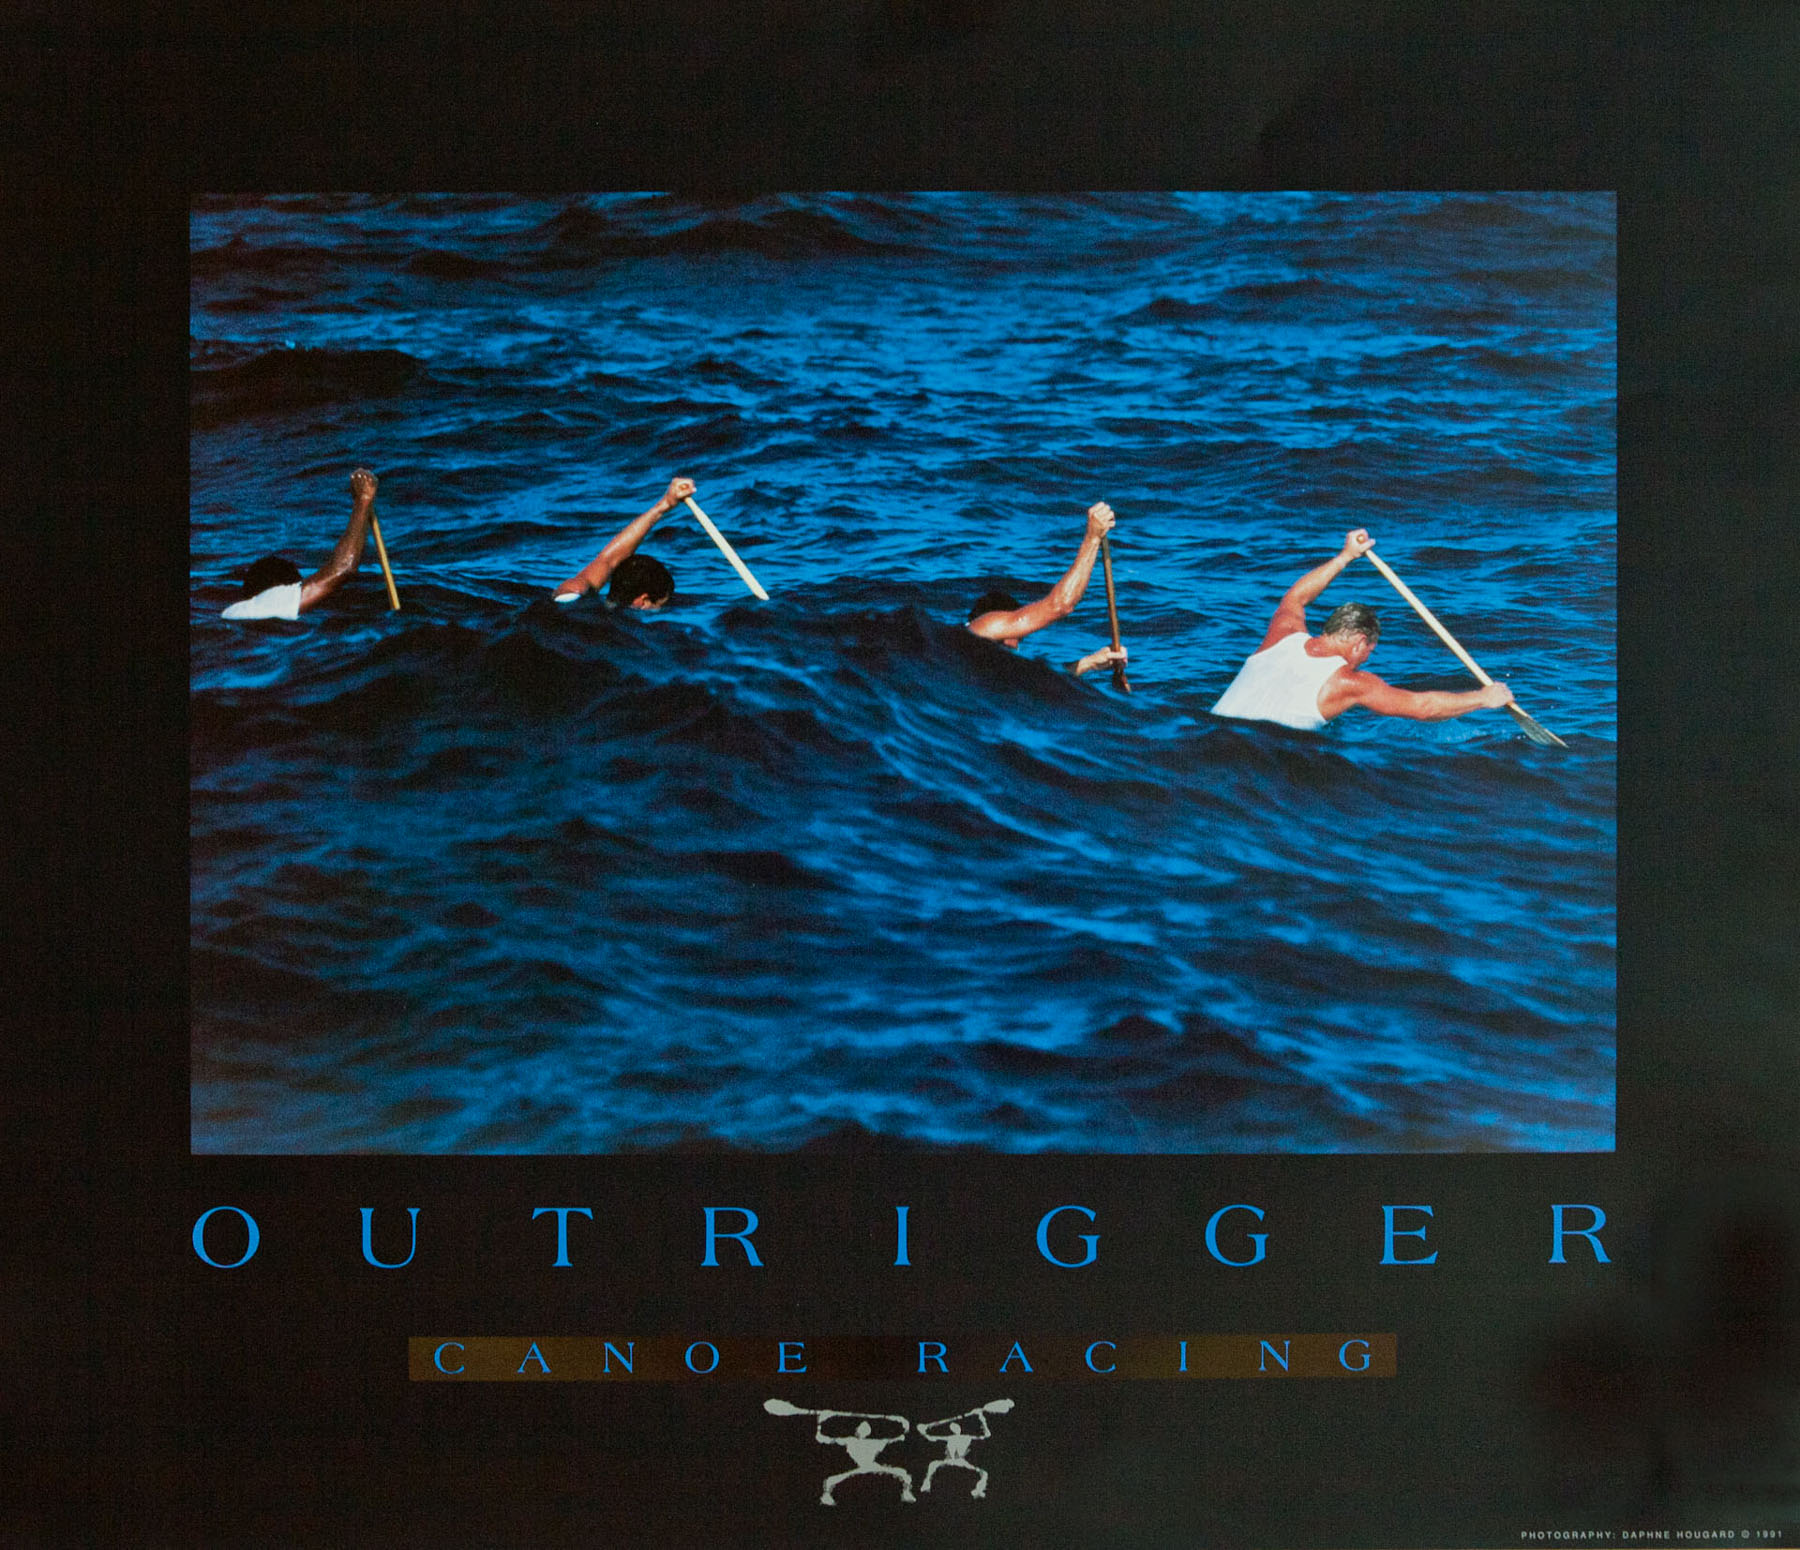 Outrigger_Poster-large_1.jpg